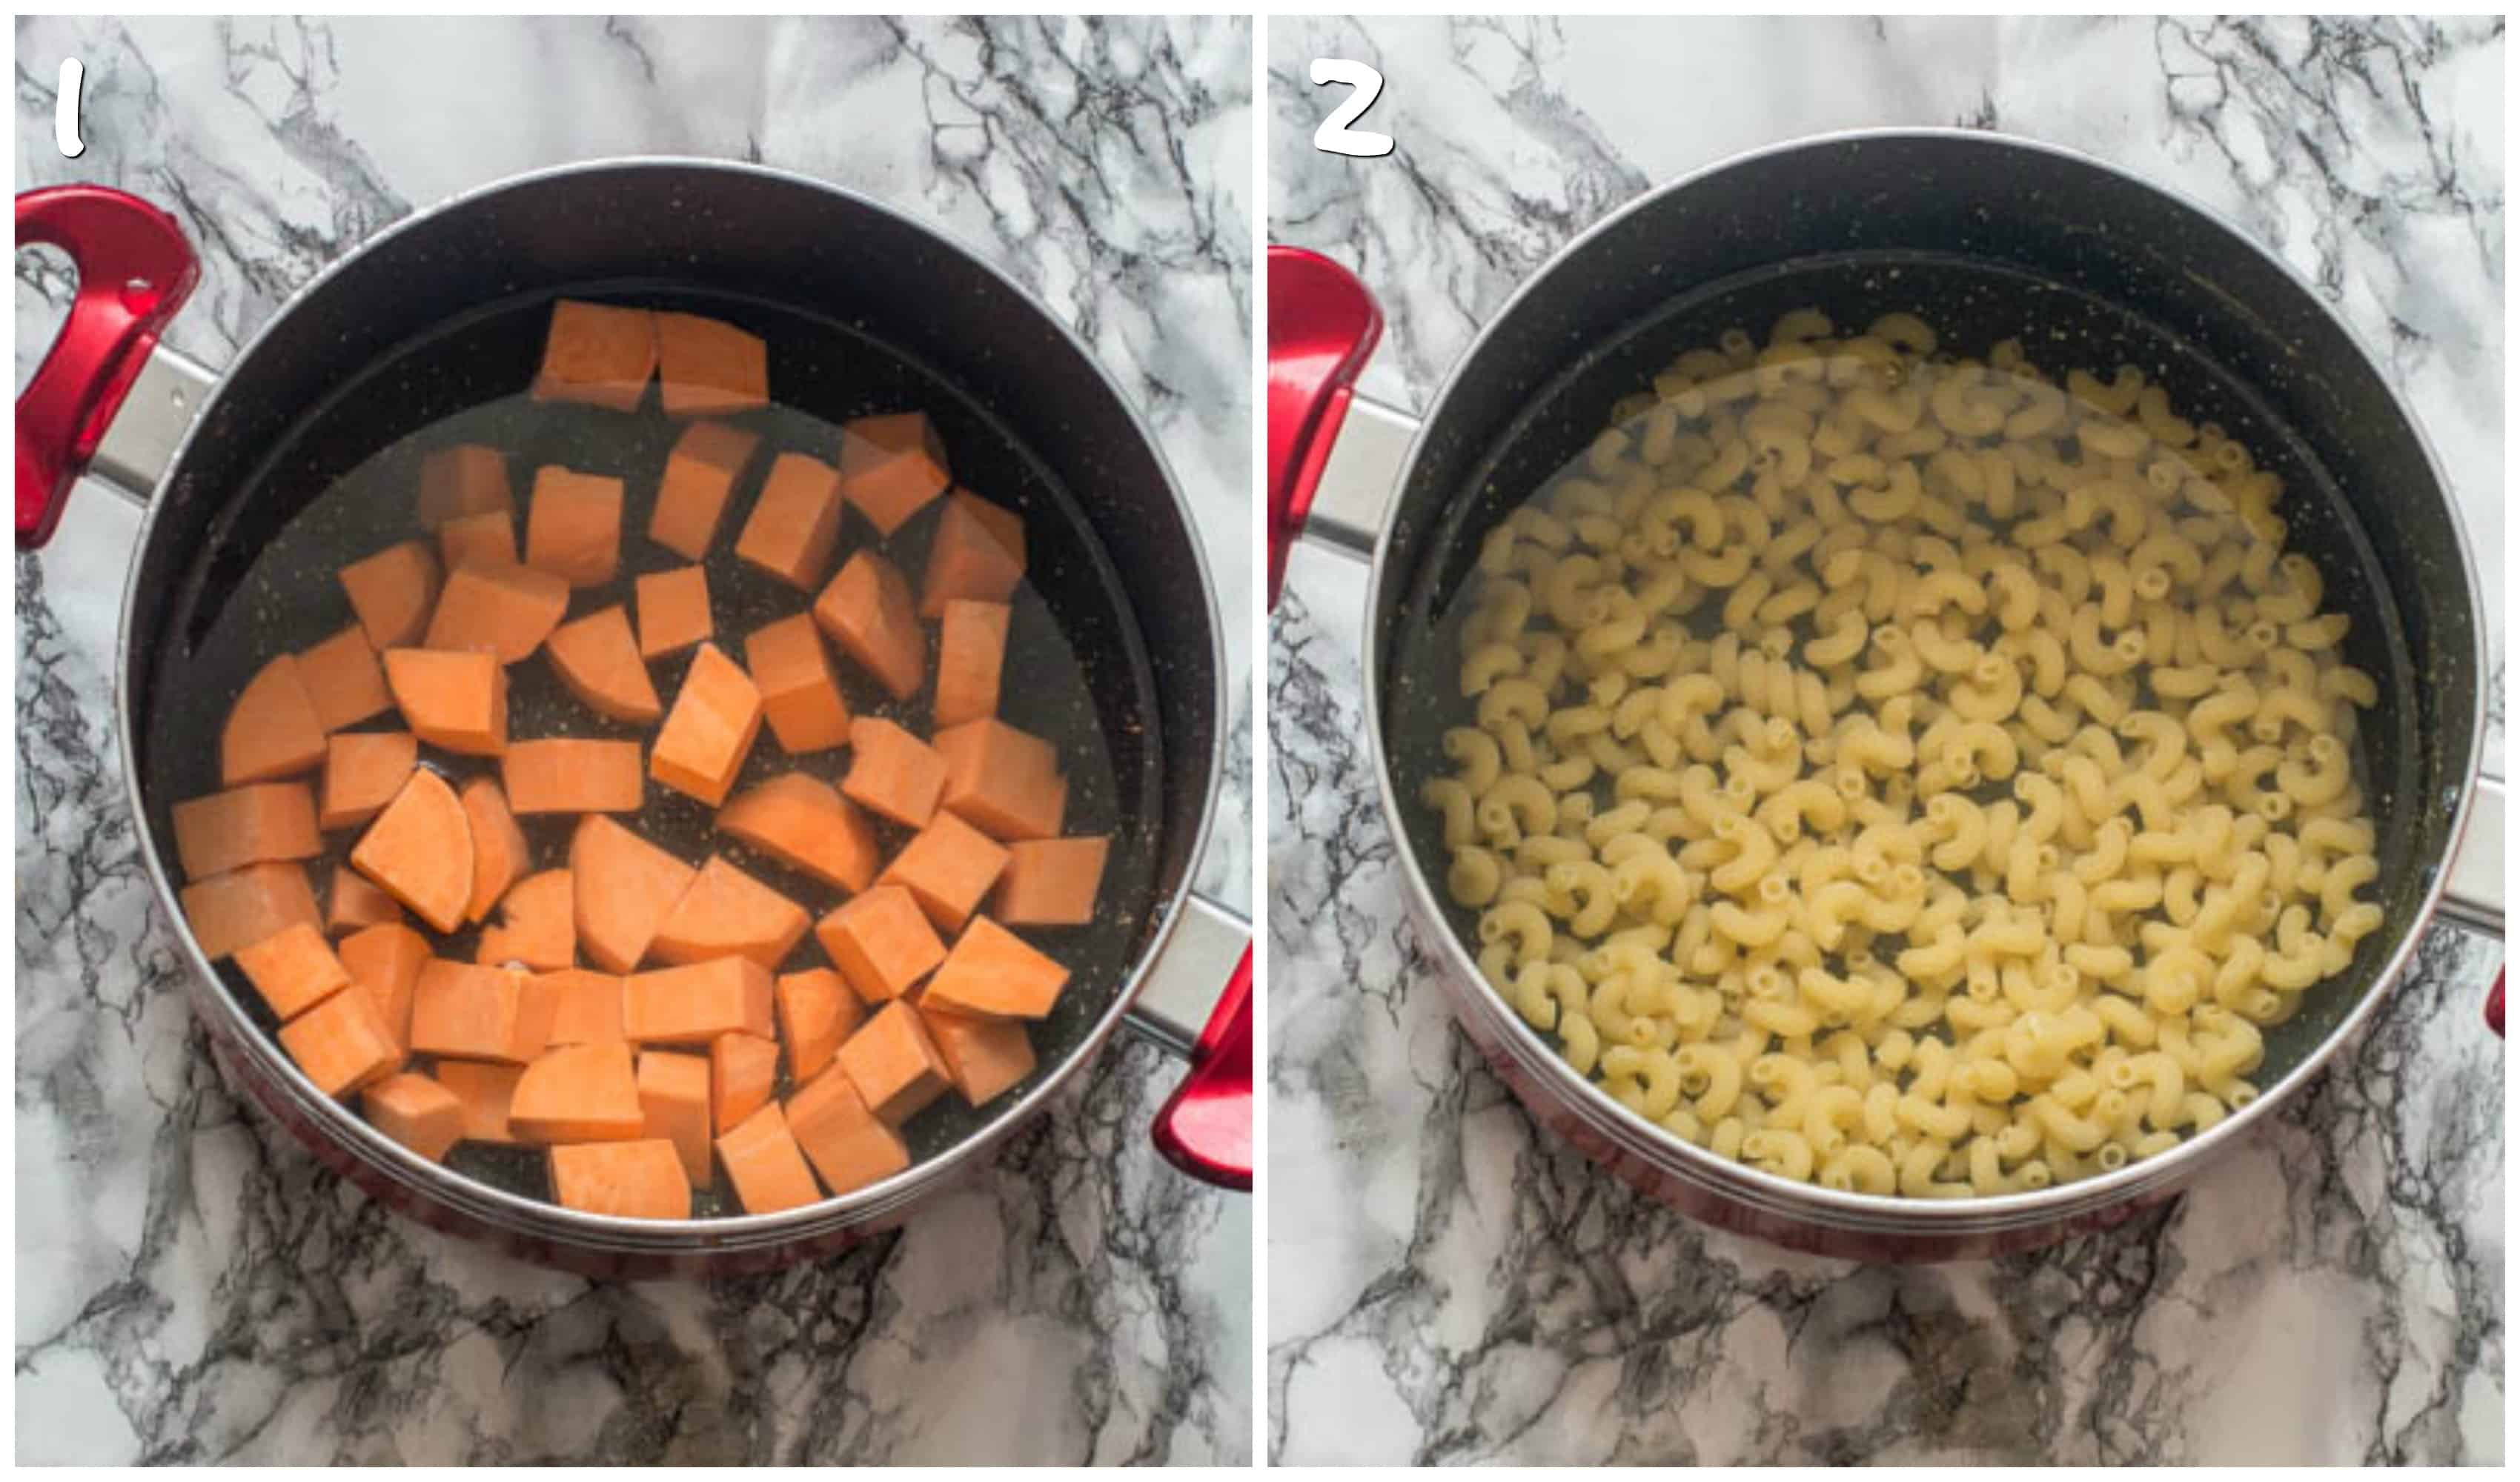 steps 1-2 boiling sweet potato and macaroni